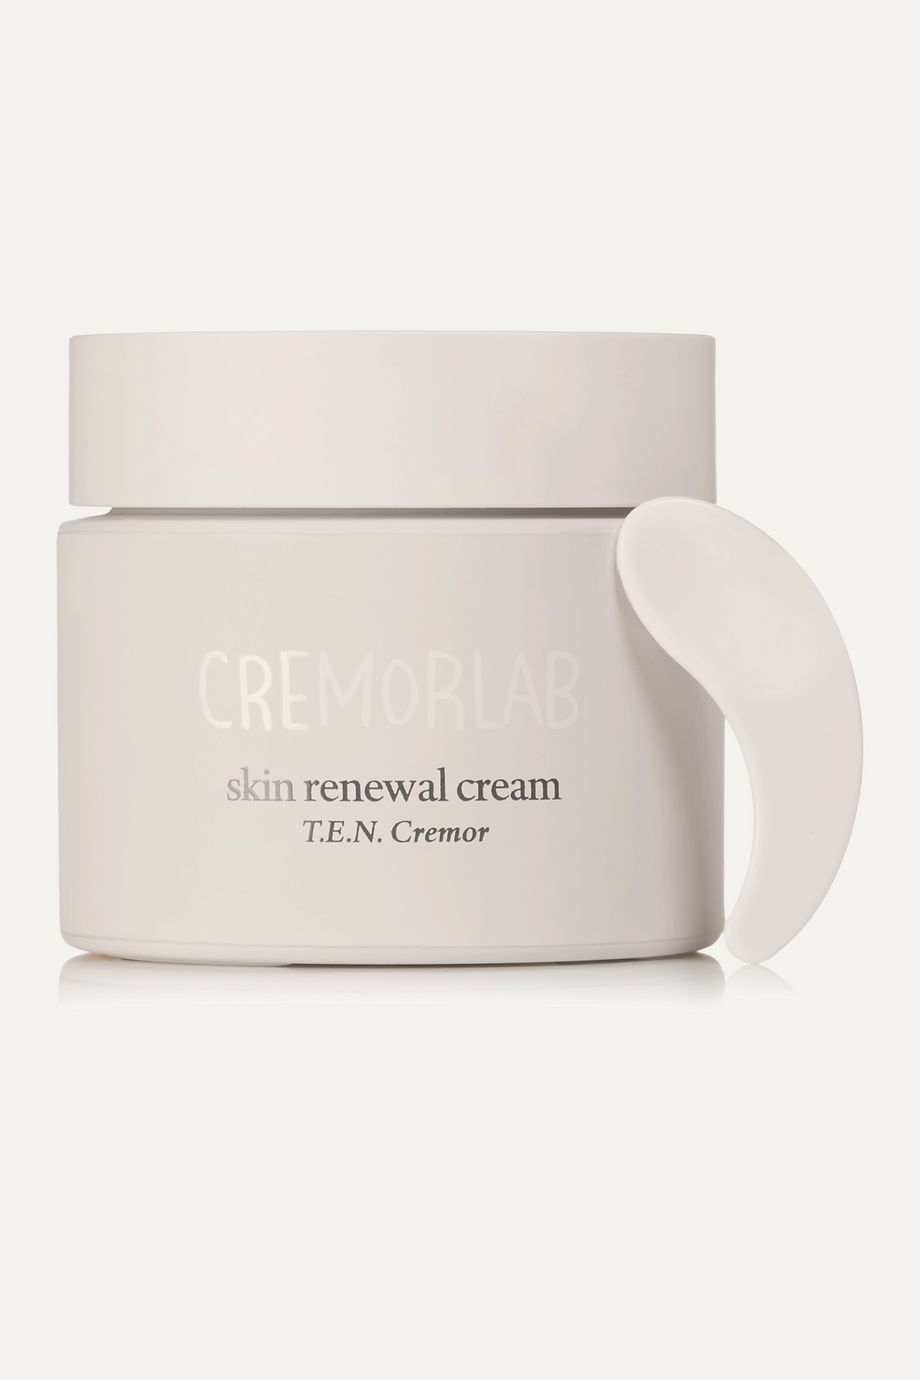 Cremorlab T.E.N Cremor Skin Renewal Cream, 45g